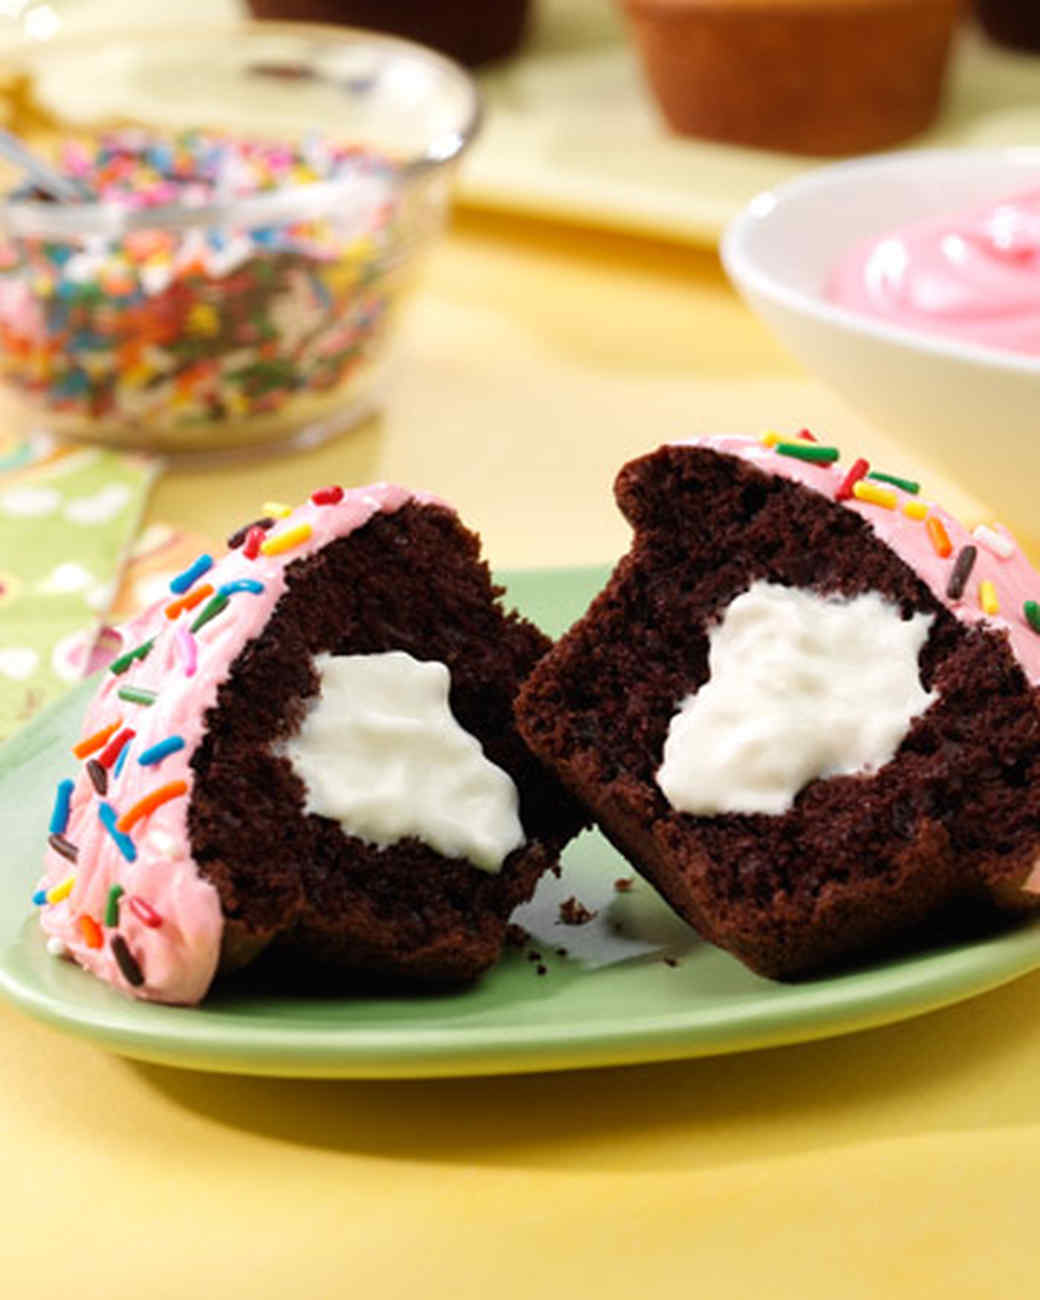 reddiwip_filled_cupcakes.jpg